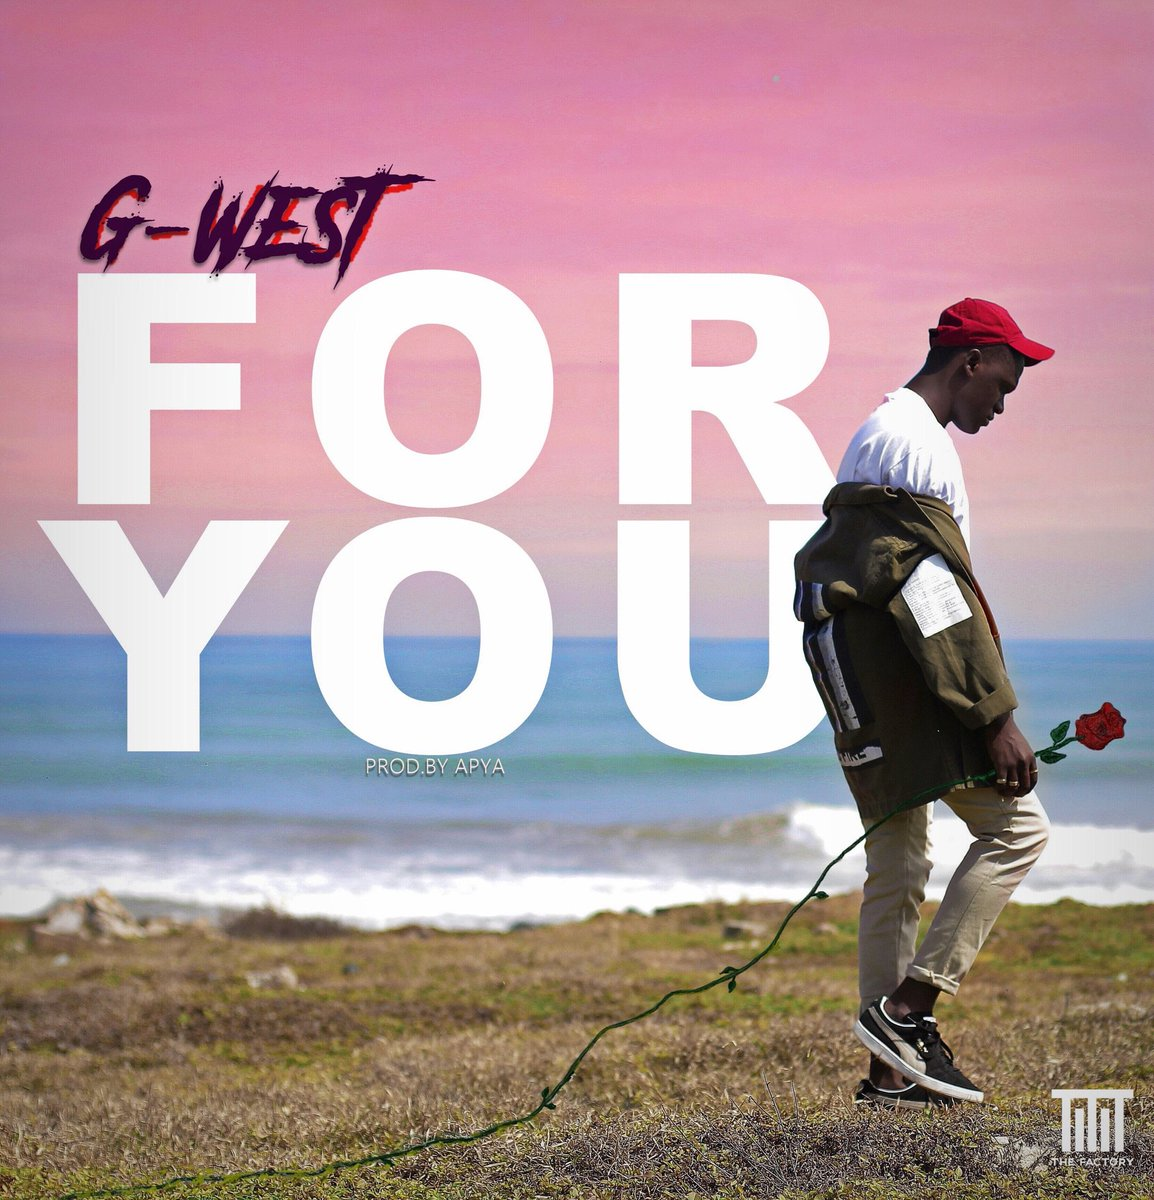 G-West #ForYou out now! Enjoy &amp; Share   SoundCloud-   https:// soundcloud.com/gwestsuperstar /g-west-for-you-prod-by-apya &nbsp; …   ITunes-  https:// itunes.apple.com/us/album/for-y ou/id1305610695?i=1305610700 &nbsp; …   Spotify-  https:// open.spotify.com/album/1HDKEOmN LvvUHiOy5yfjOZ &nbsp; …   Tidal-  https:// tidal.com/track/80762753  &nbsp;    https:// tidal.com/track/80762753  &nbsp;    @gwestsuperstar<br>http://pic.twitter.com/4FBkxqeYAn